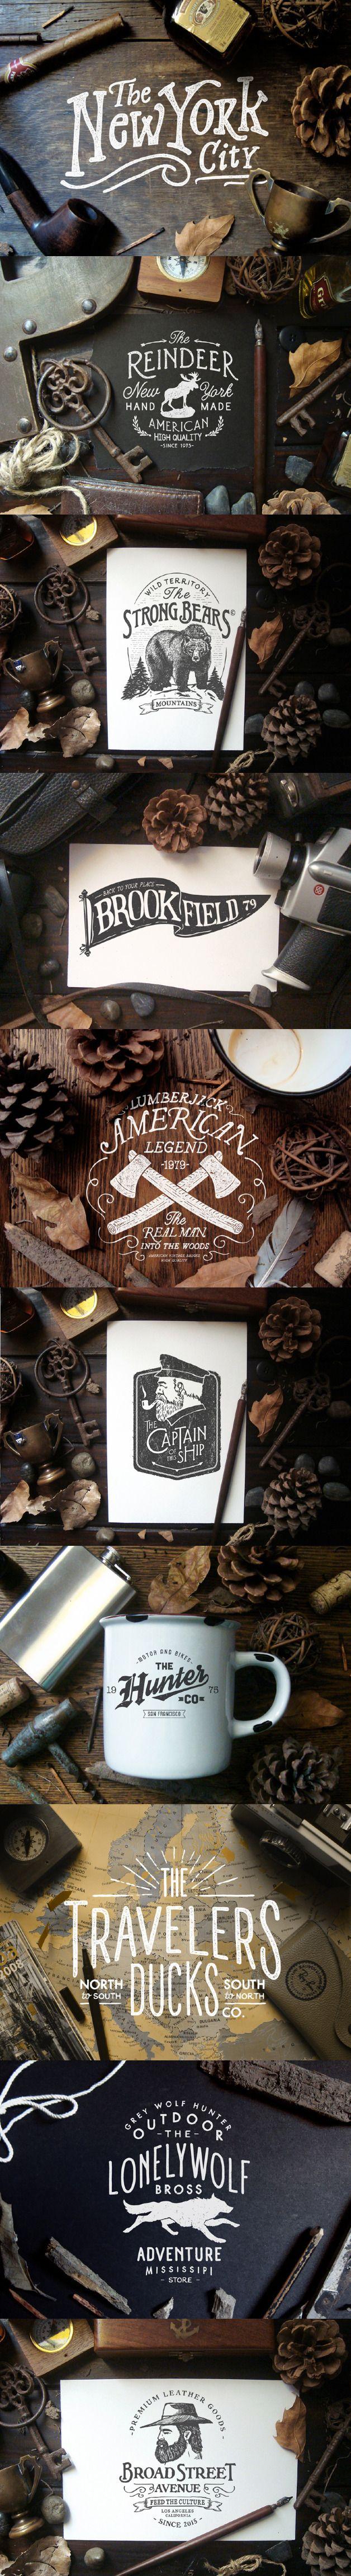 American Rustic by OPUSNIGRUM .